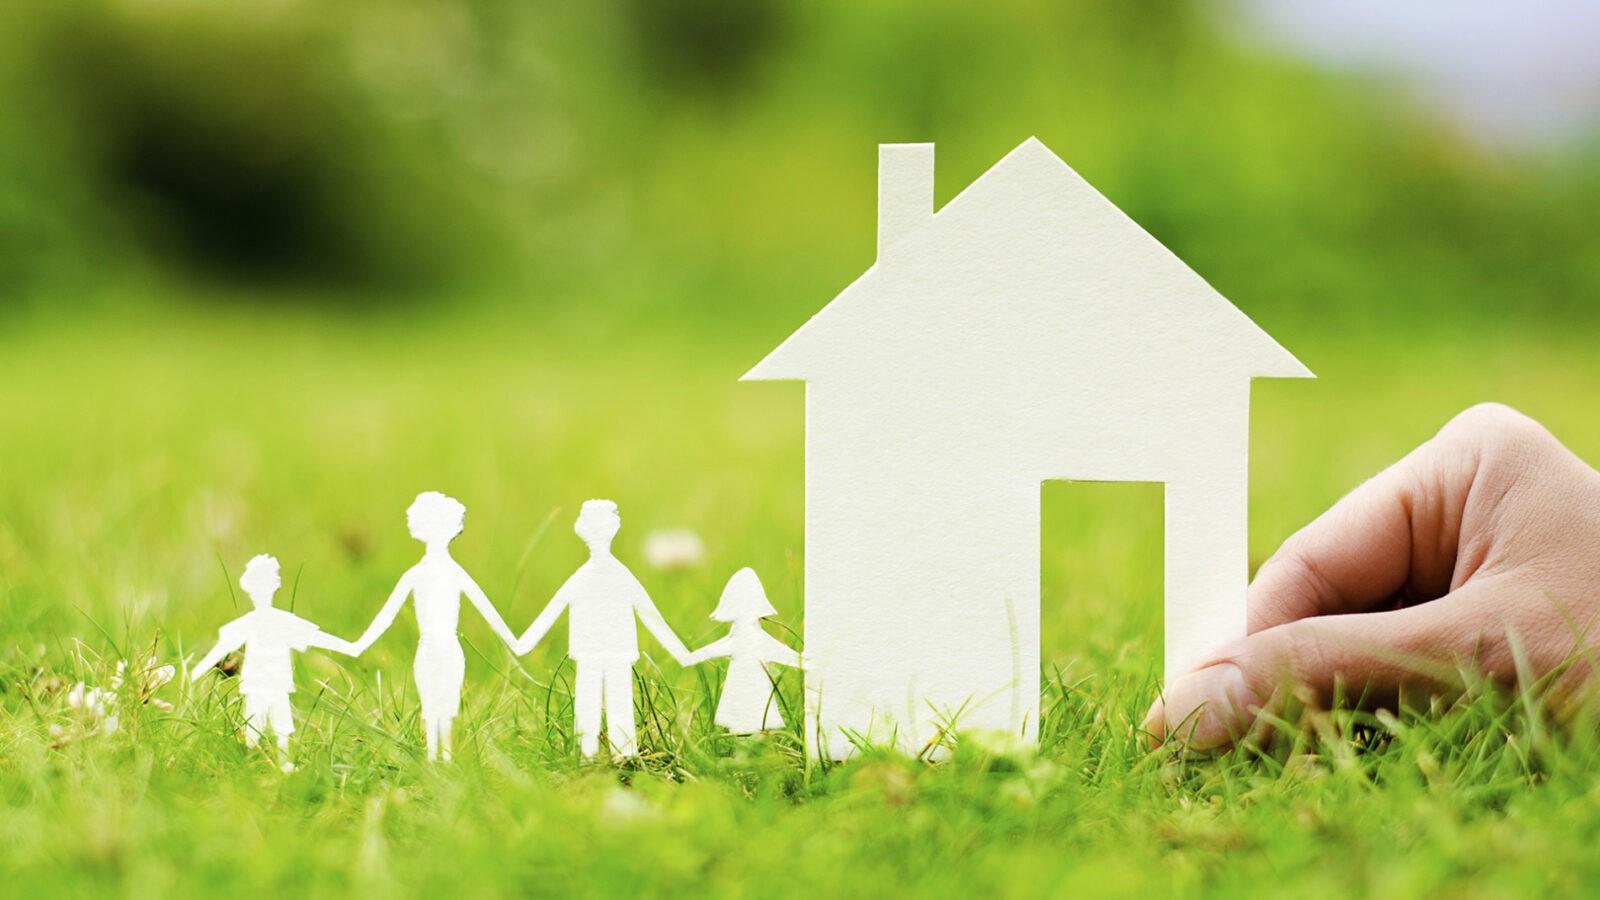 Paper Escape: Buy A Home